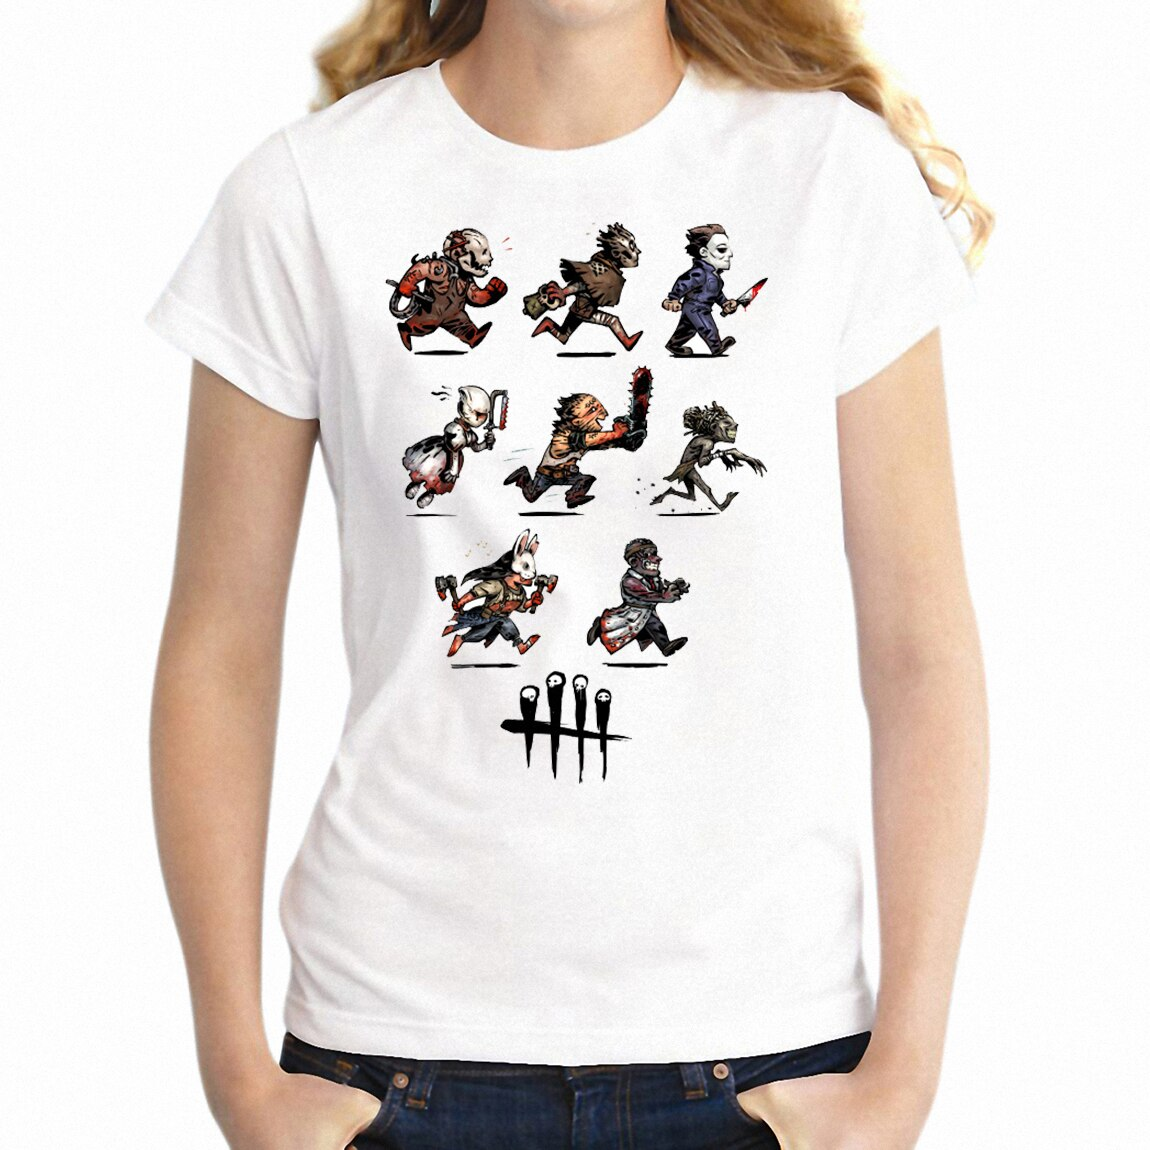 Camiseta de mujer Jigsaw Saw Jason Friday The 13th Chucky Horror Friends divertida camiseta Geek Camiseta de chica